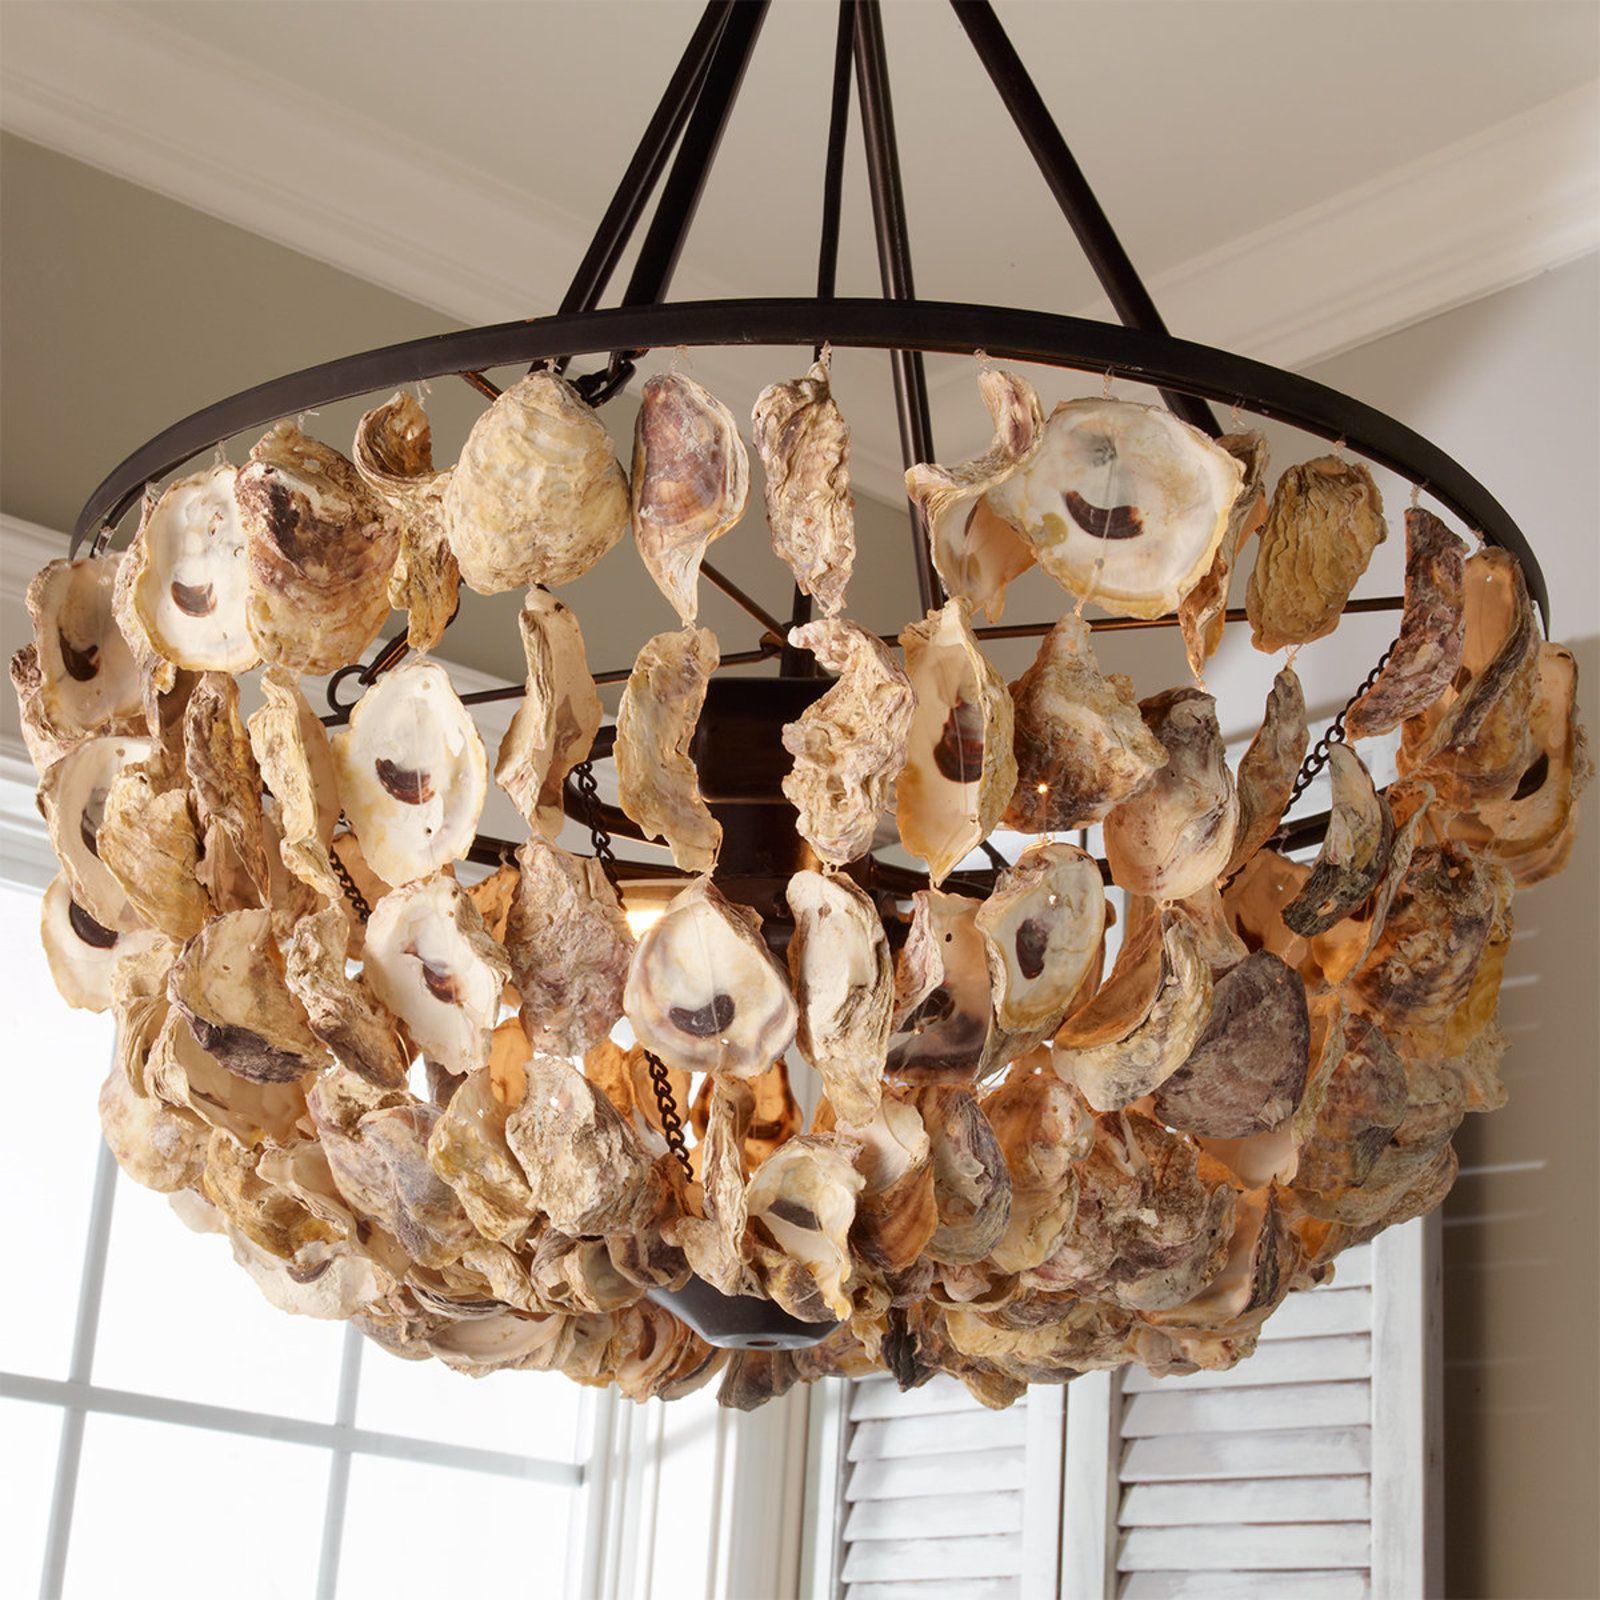 Oyster shell basket chandelier oyster shells chandeliers and house oyster shell basket chandelier mozeypictures Images